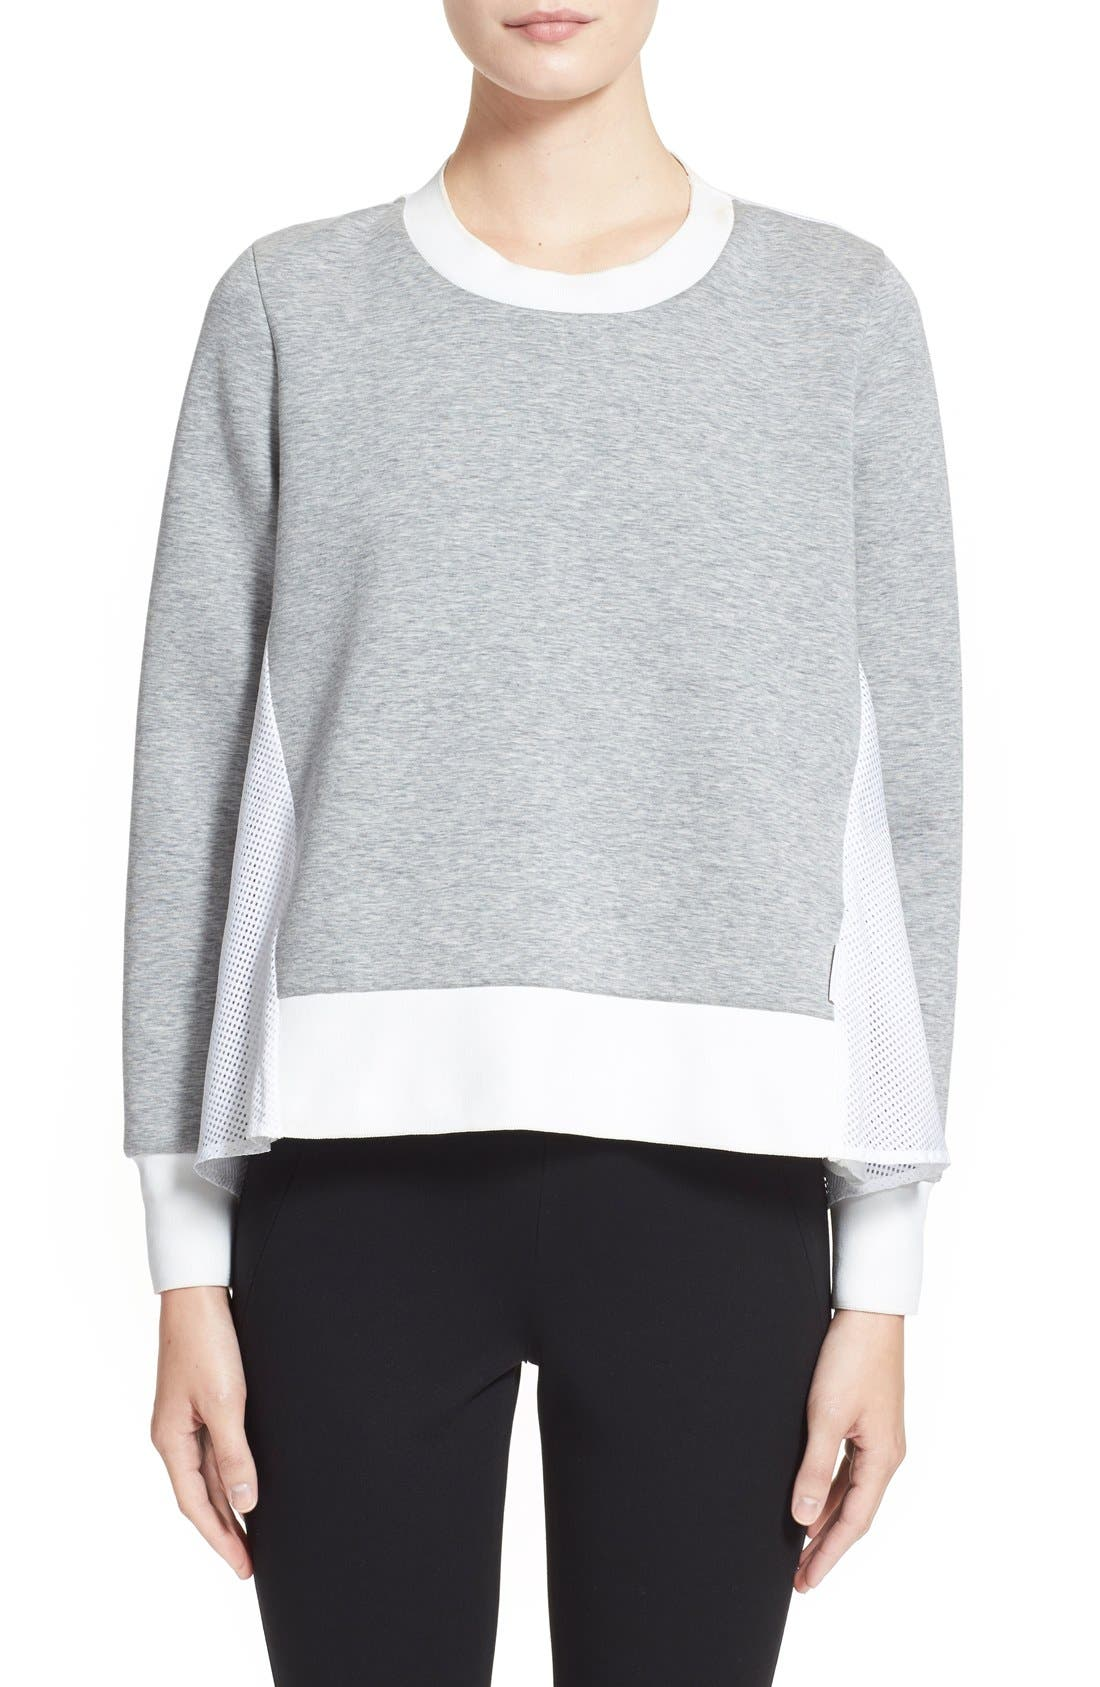 'Maglia Girocollo' Mixed Media Sweatshirt,                             Main thumbnail 1, color,                             021